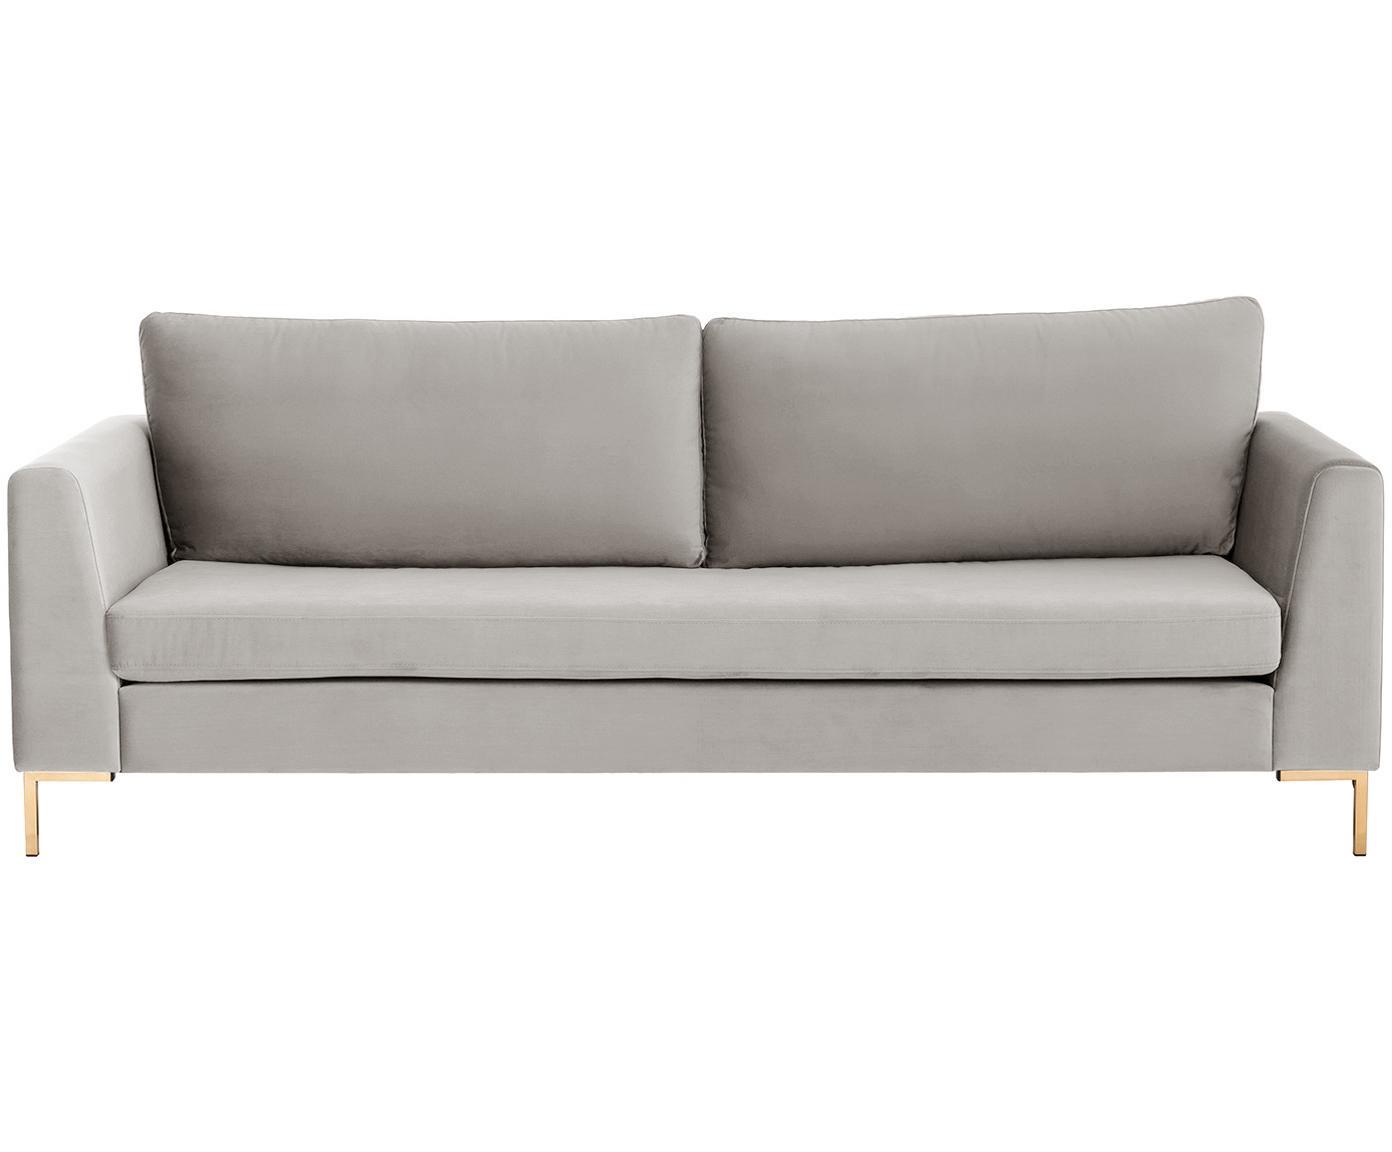 Samt-Sofa Luna (3-Sitzer), Bezug: Samt (Polyester) 80.000 S, Gestell: Massives Buchenholz, Füße: Metall, galvanisiert, Samt Beige, Gold, B 230 x T 95 cm